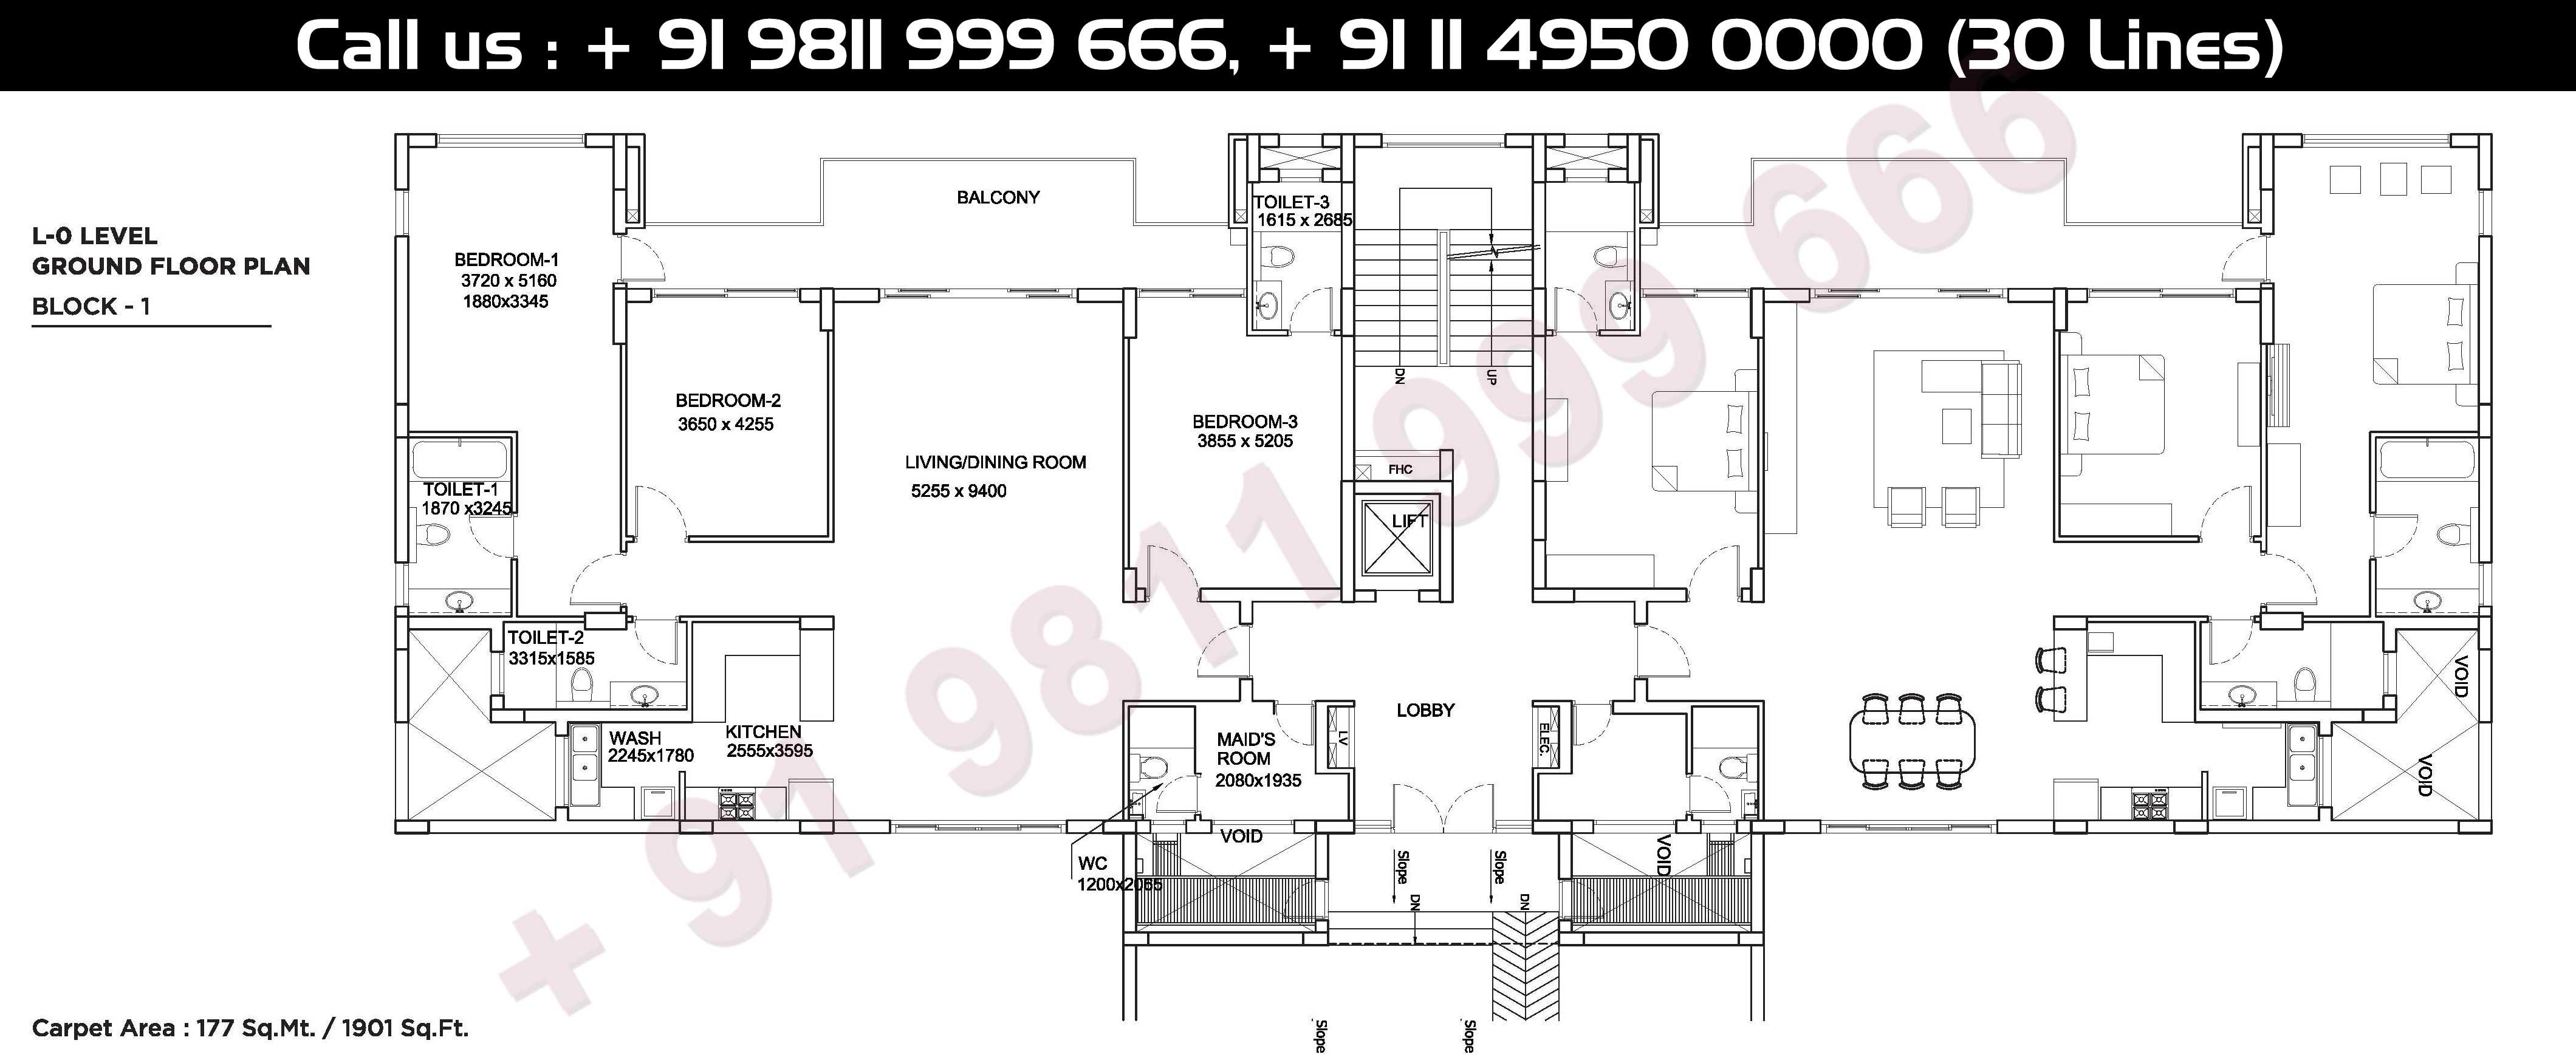 0 - Level, Ground Floor Plan, Carpet Area: 1901 Sq. Ft